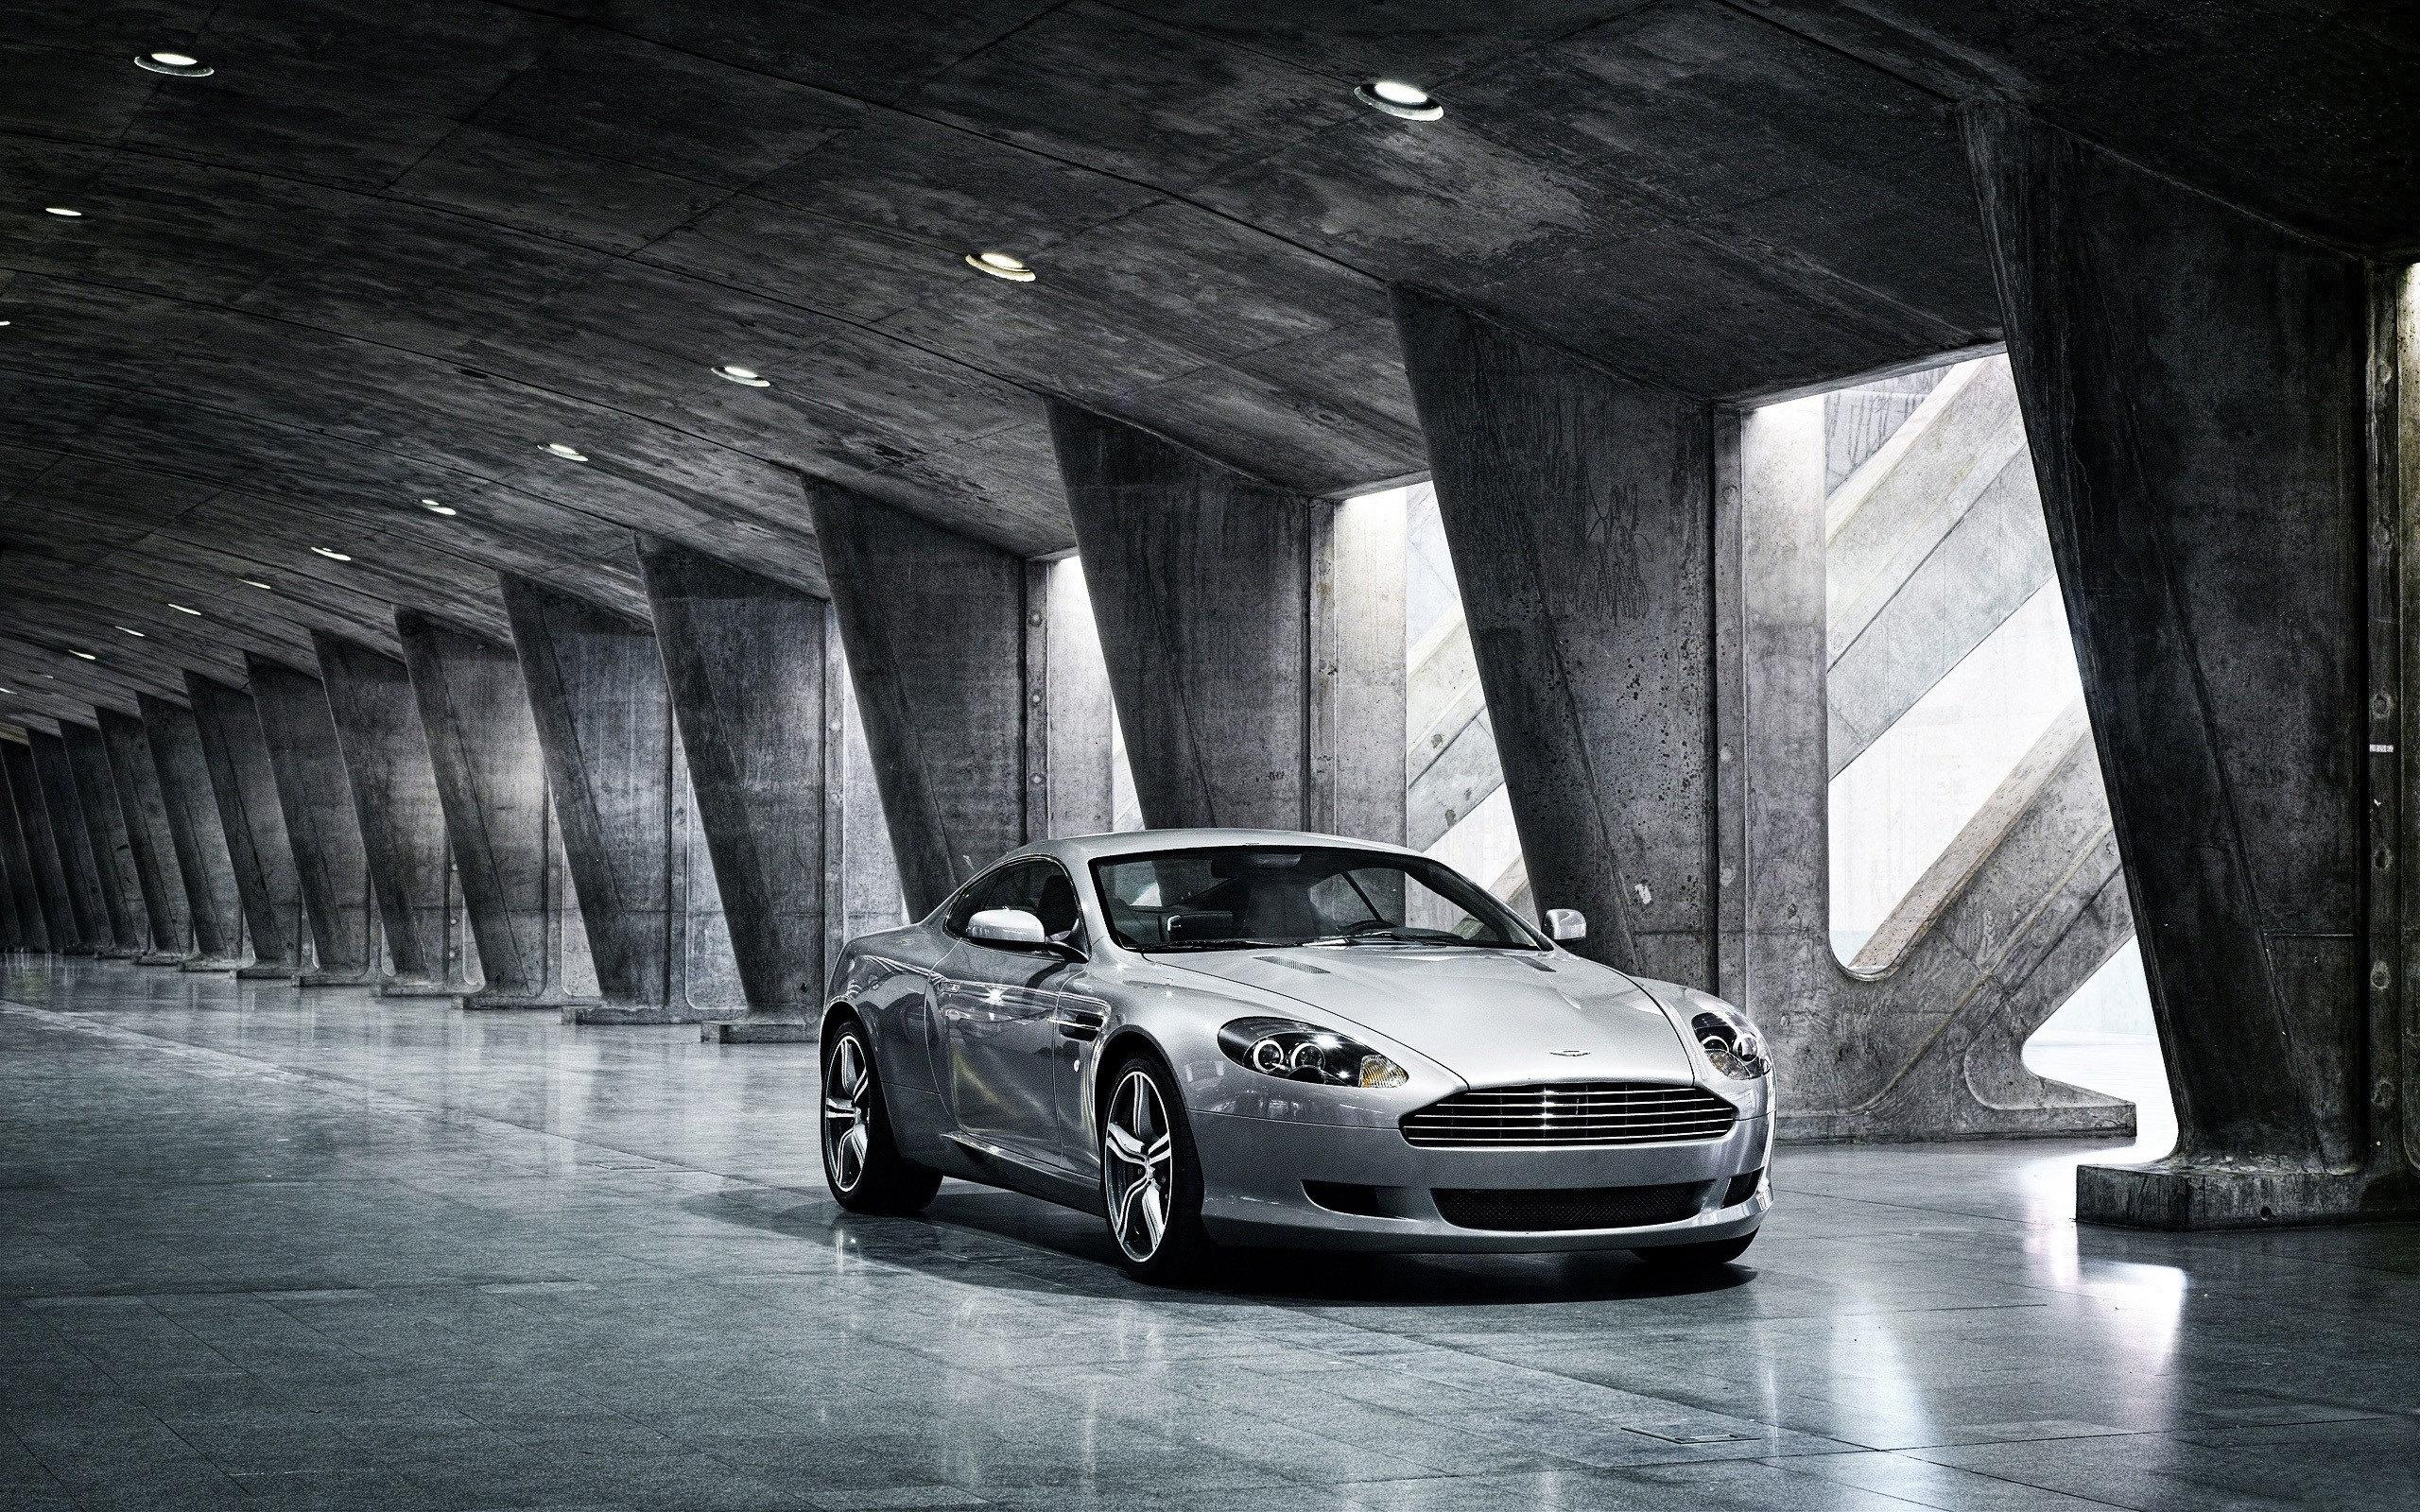 Aston Martin Db9 Wallpaper 2560x1600 1125 Wallpaperup